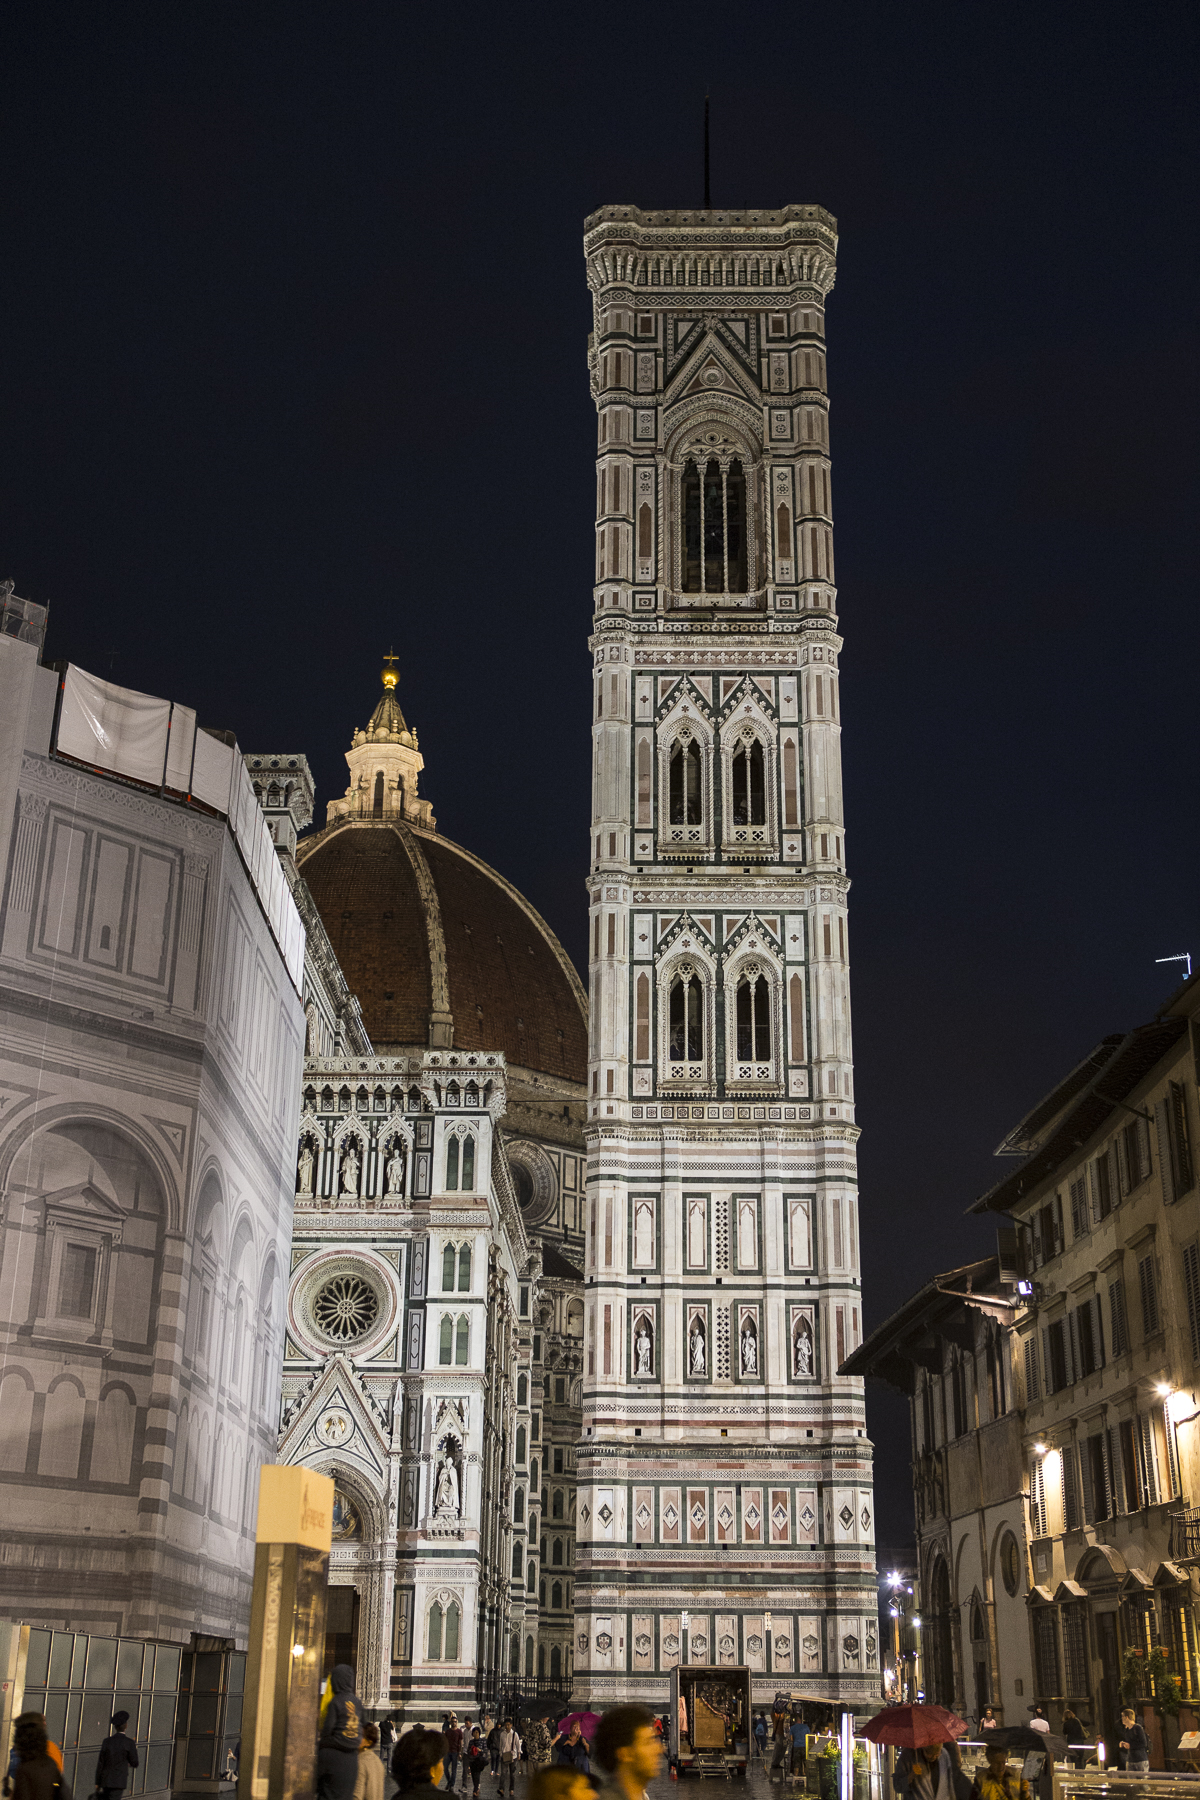 Firenze nights-1.jpg